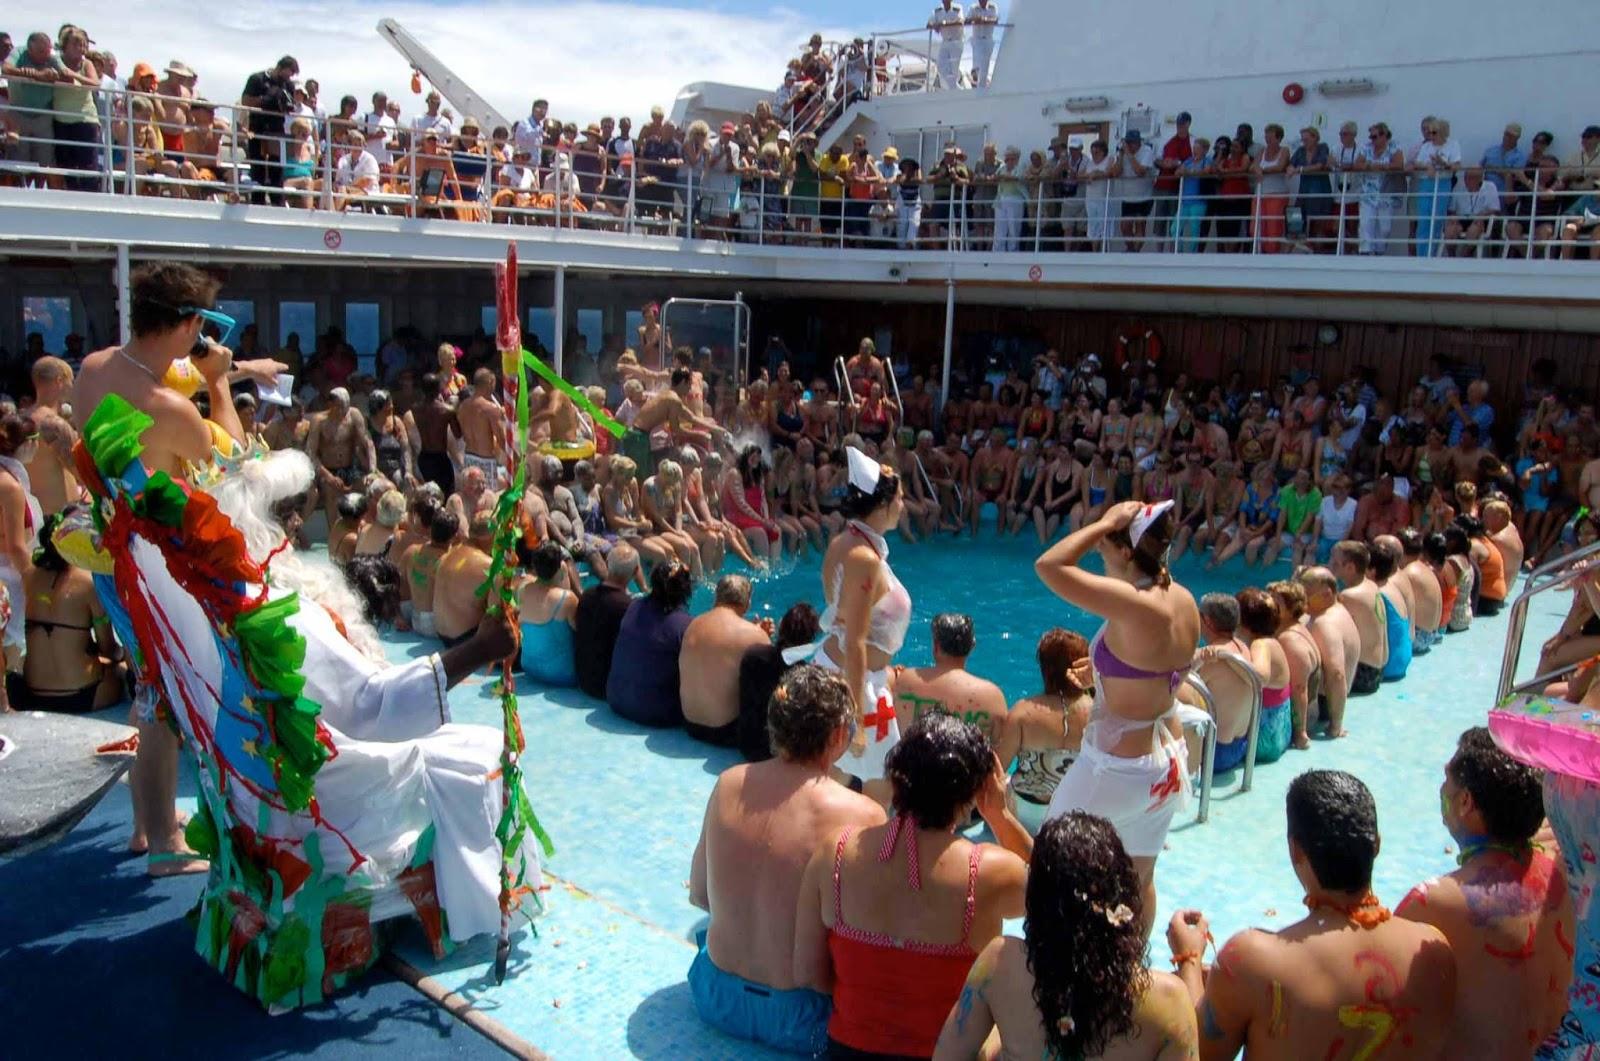 cruise ships tip: celebrating spring break aboard a cruise ship